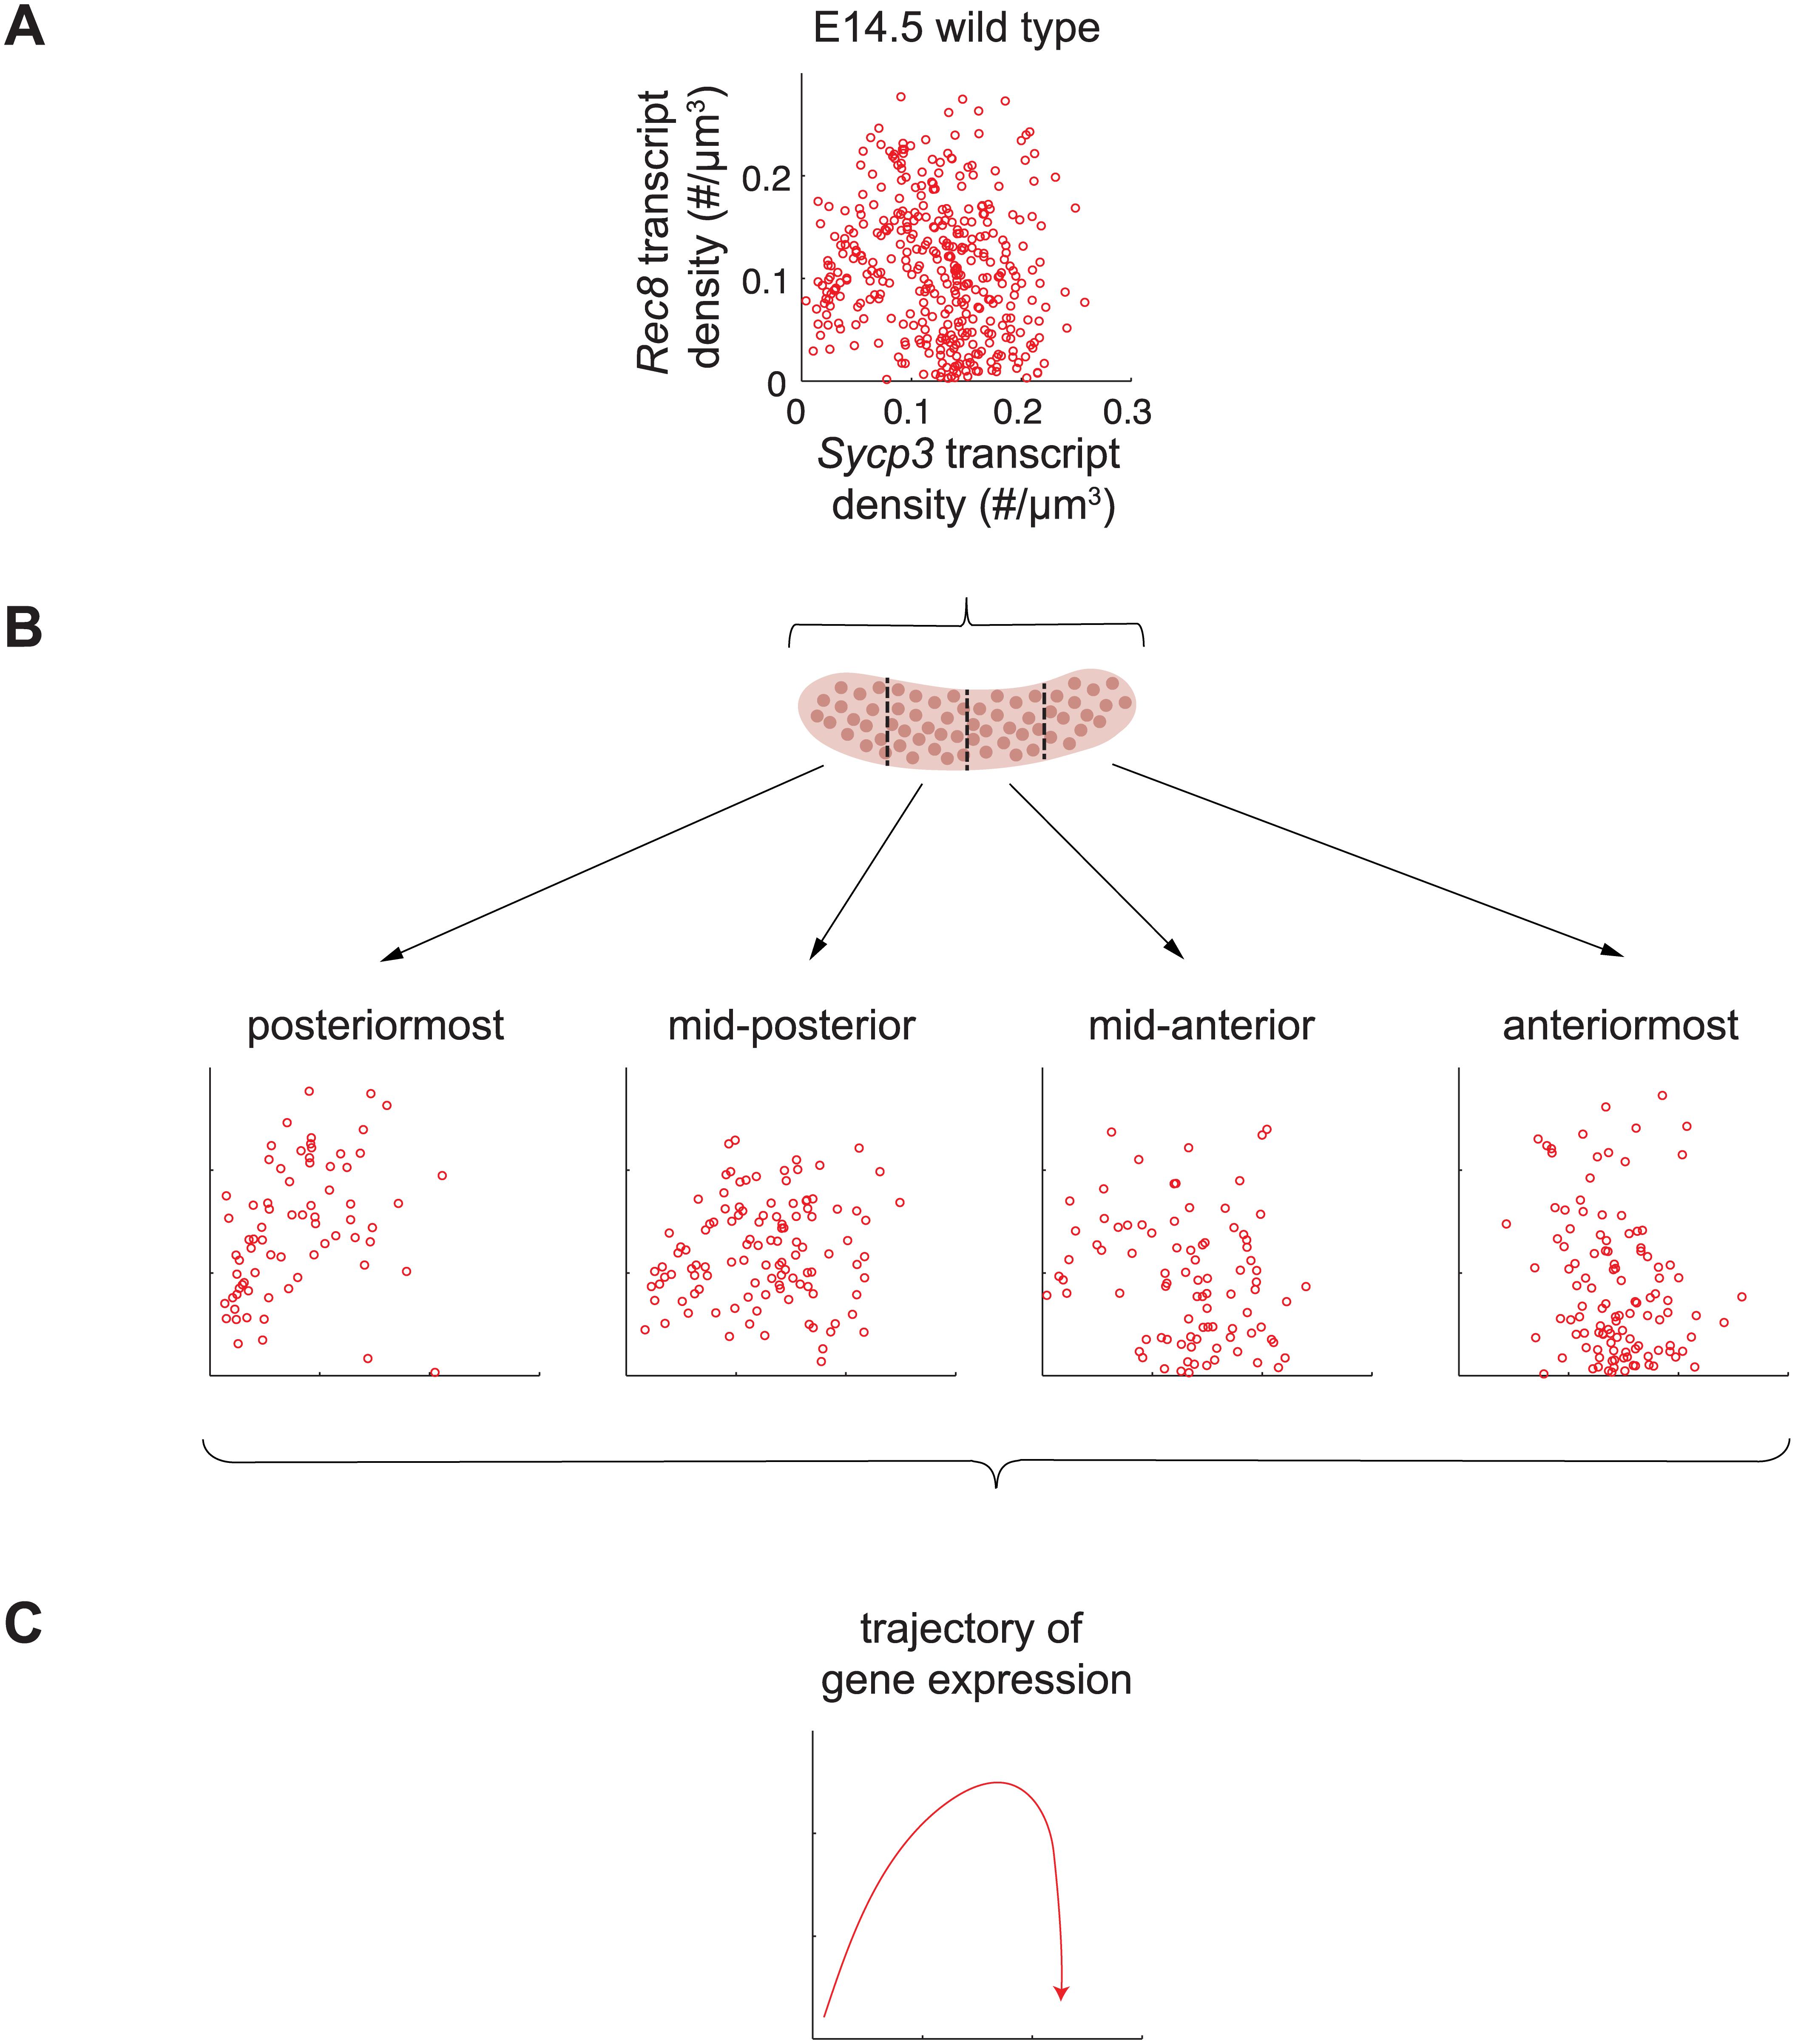 <i>Sycp3</i> induction precedes negative regulation of <i>Rec8</i> along the anterior-posterior axis of the E14.5 ovary.